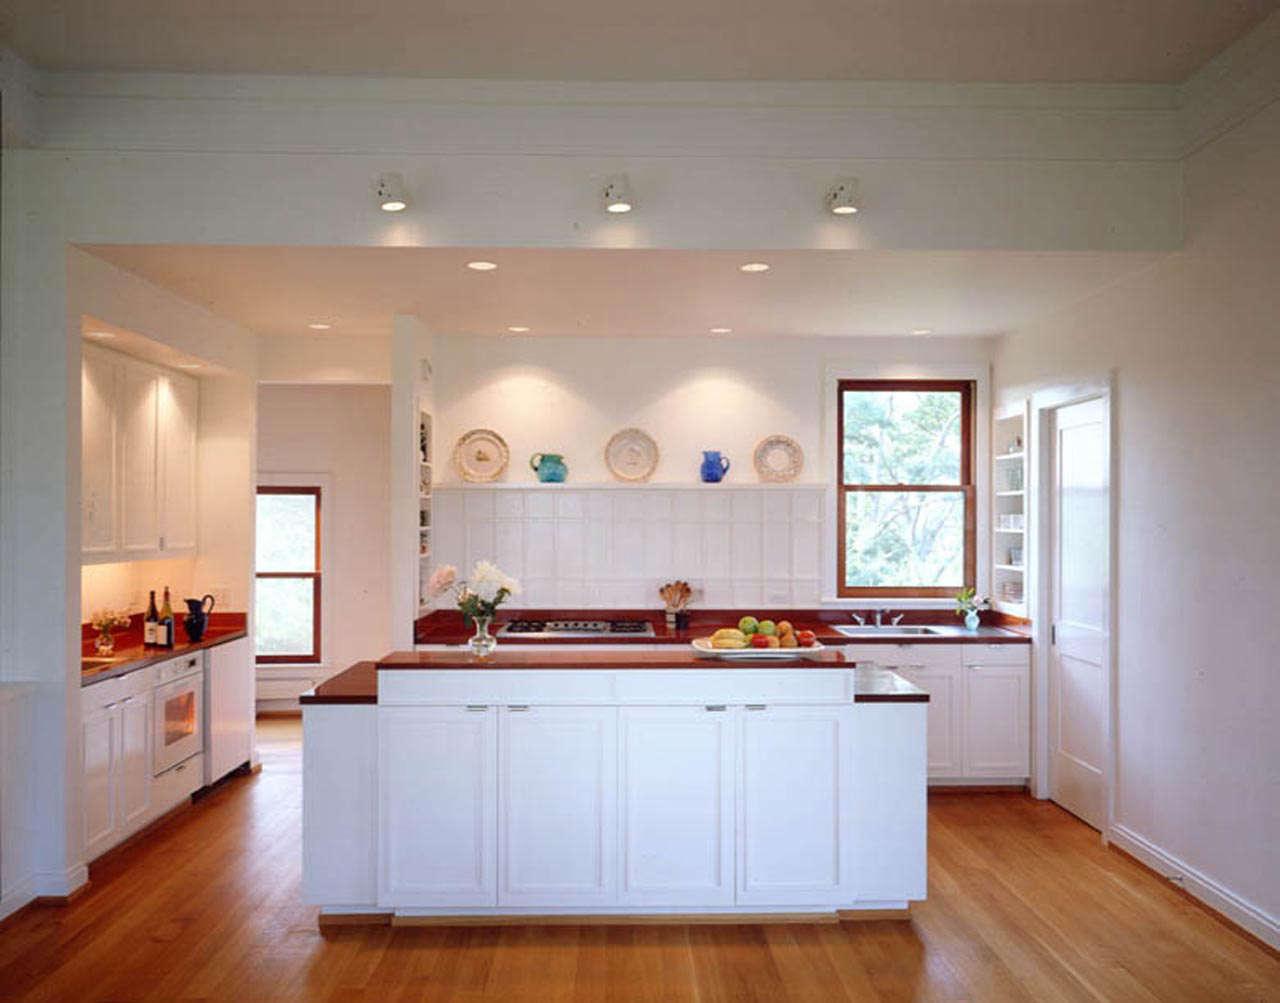 Architect Visit Jerome Buttrick Kitchen portrait 3